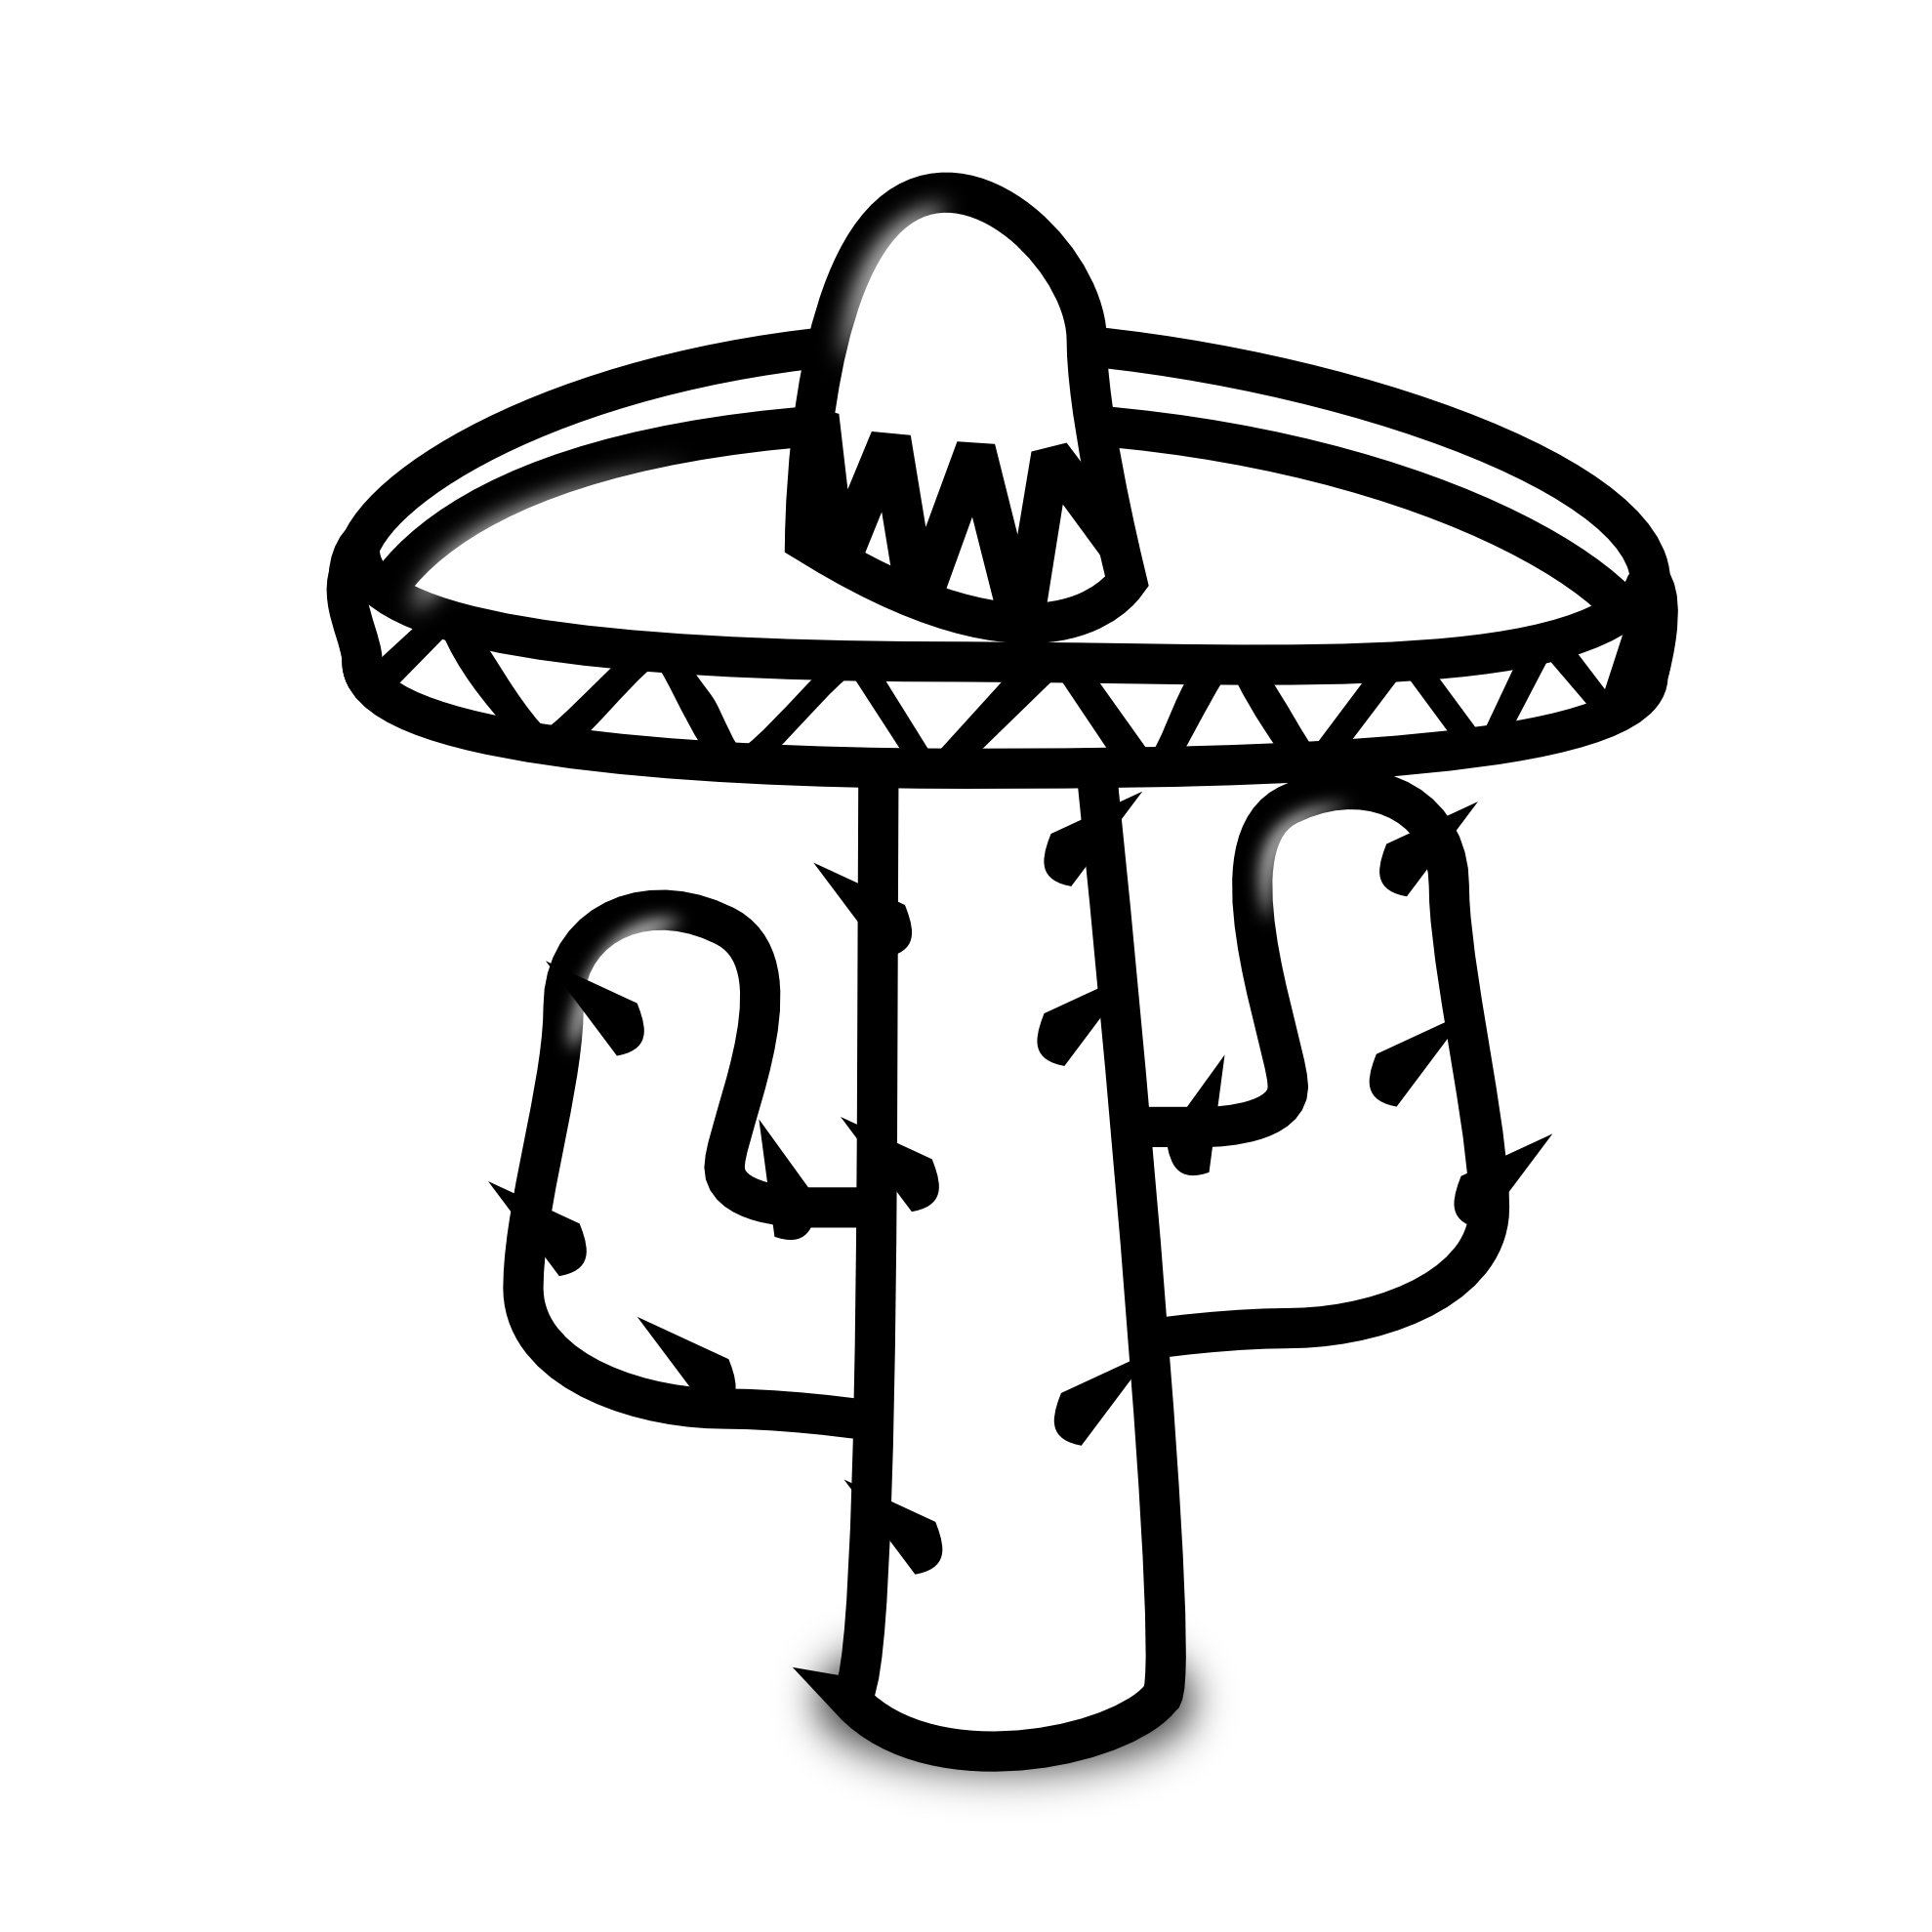 Cactus Clipart Black And White Cactus 19 Black White Line